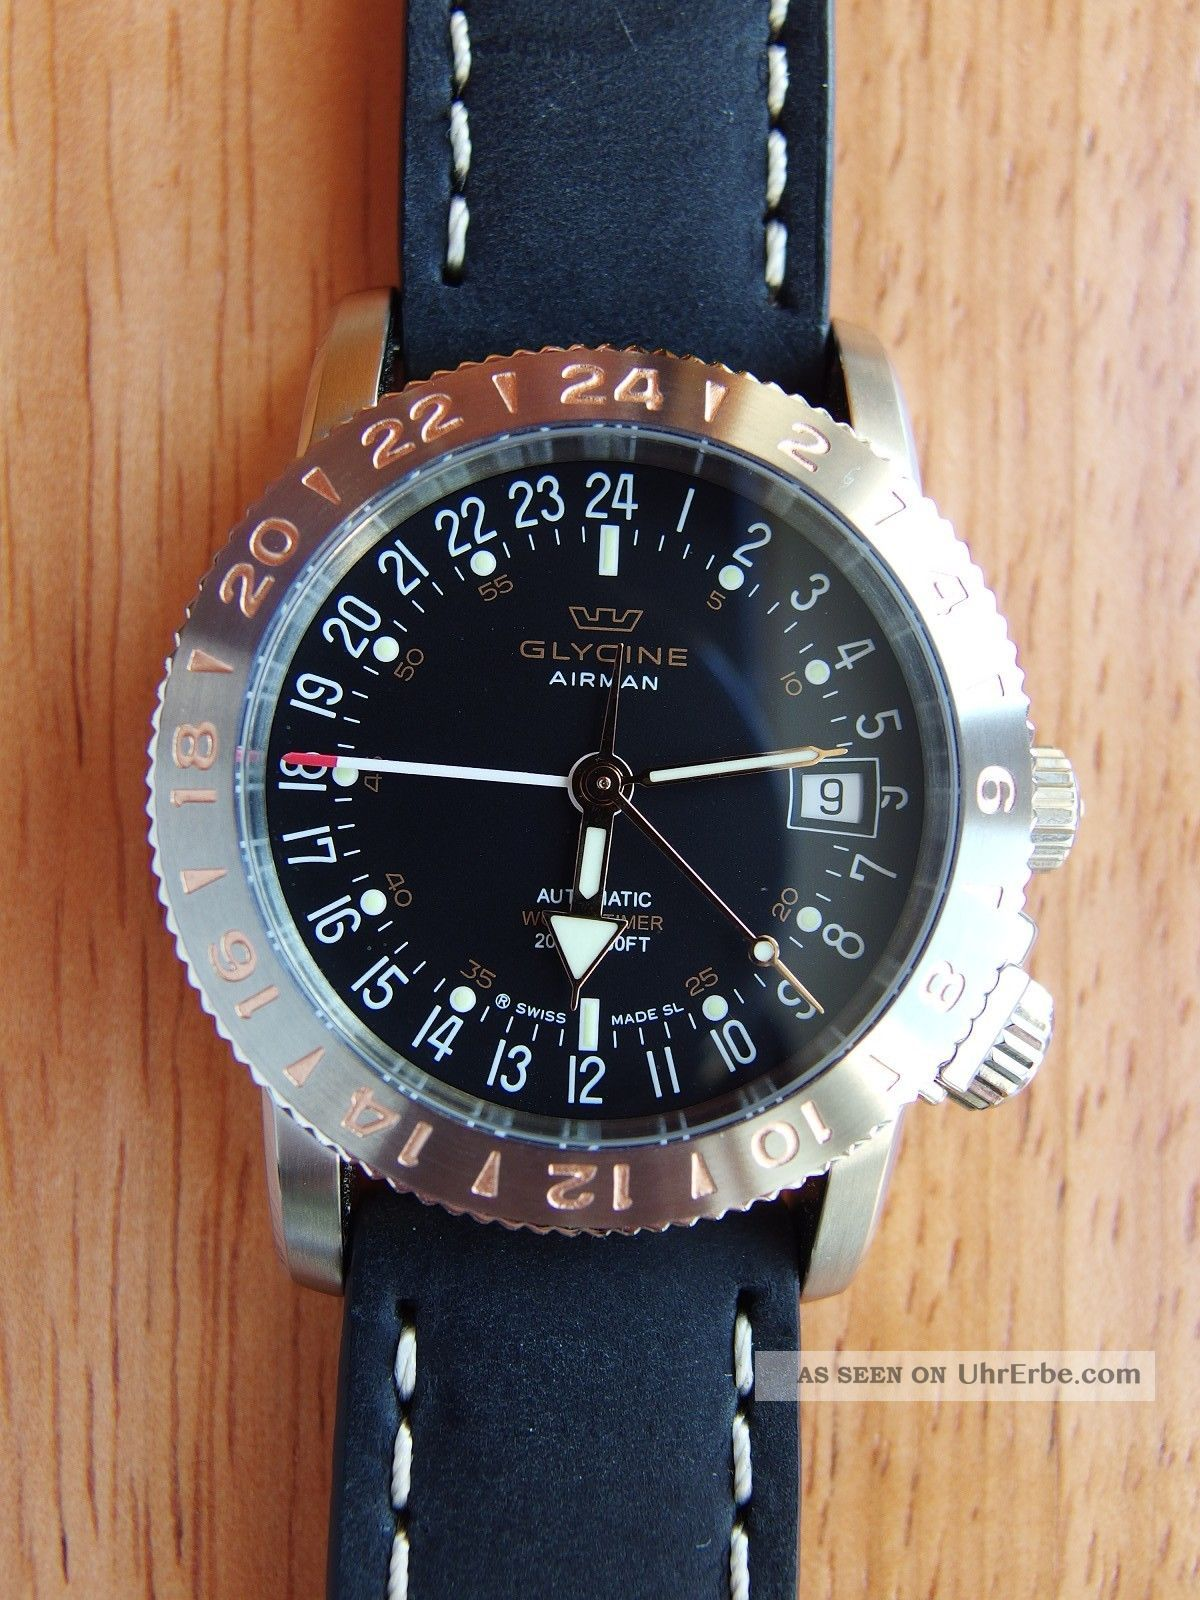 Glycine Airman 18 Ref.  3866.  196 - Lb9 Red Gold, Armbanduhren Bild